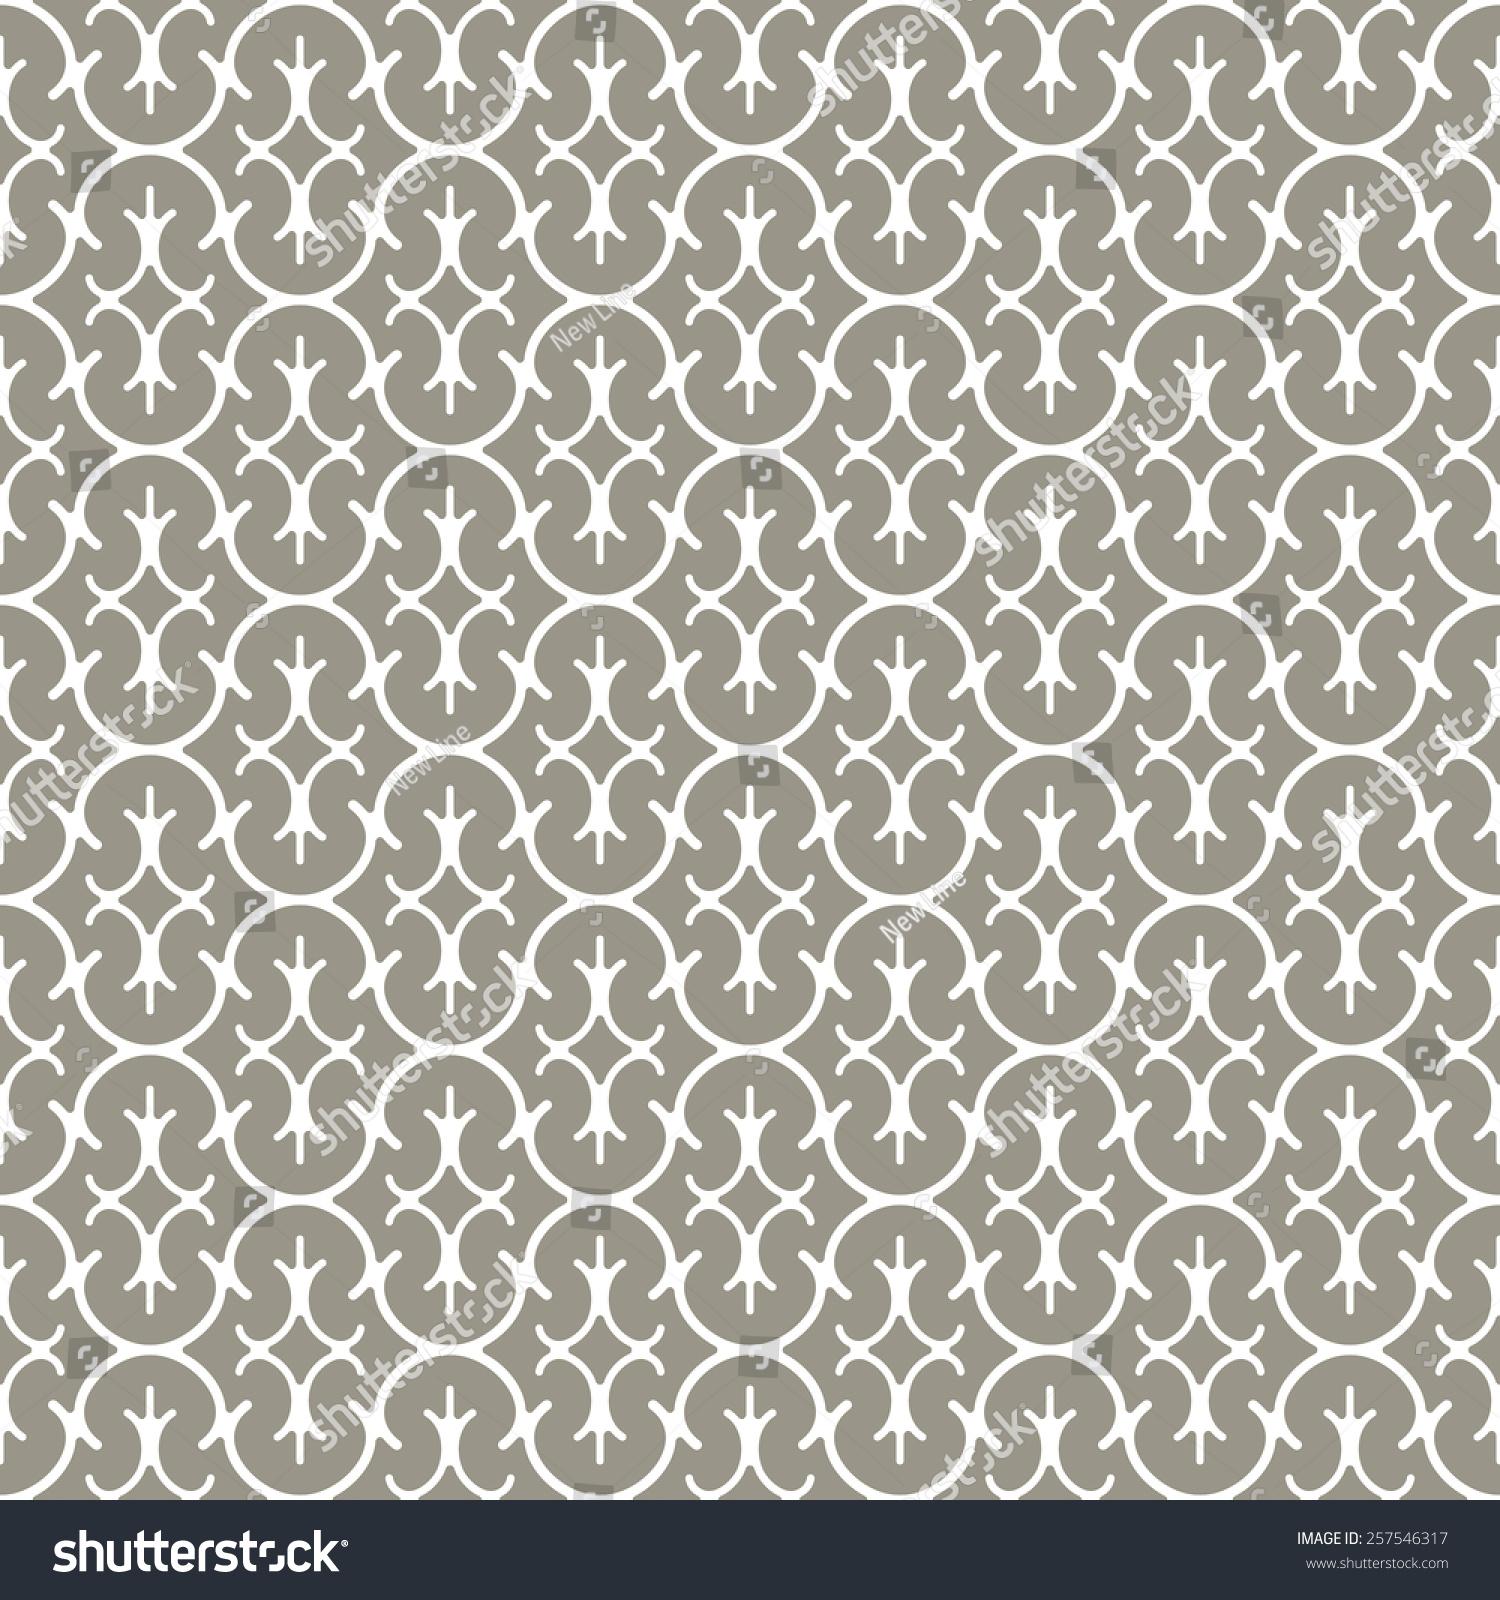 Moroccan geometric pattern royalty free stock photos image 13547078 - Seamless